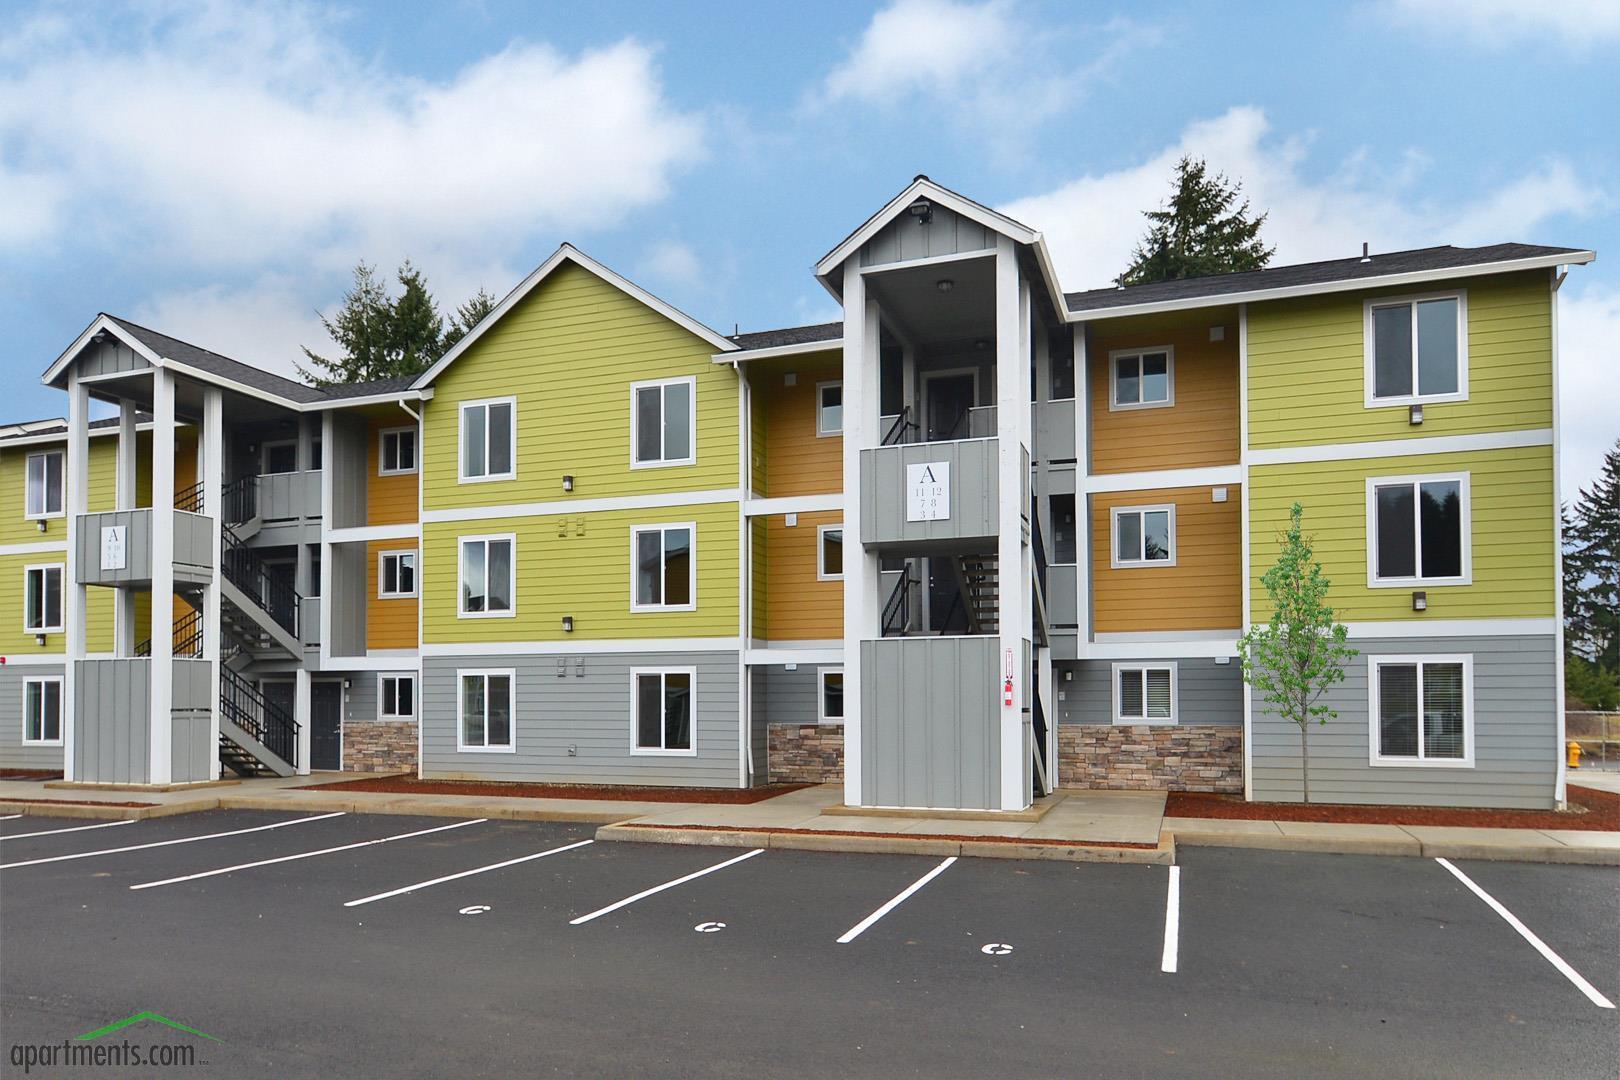 Rock Creek Commons Apartments photo #1